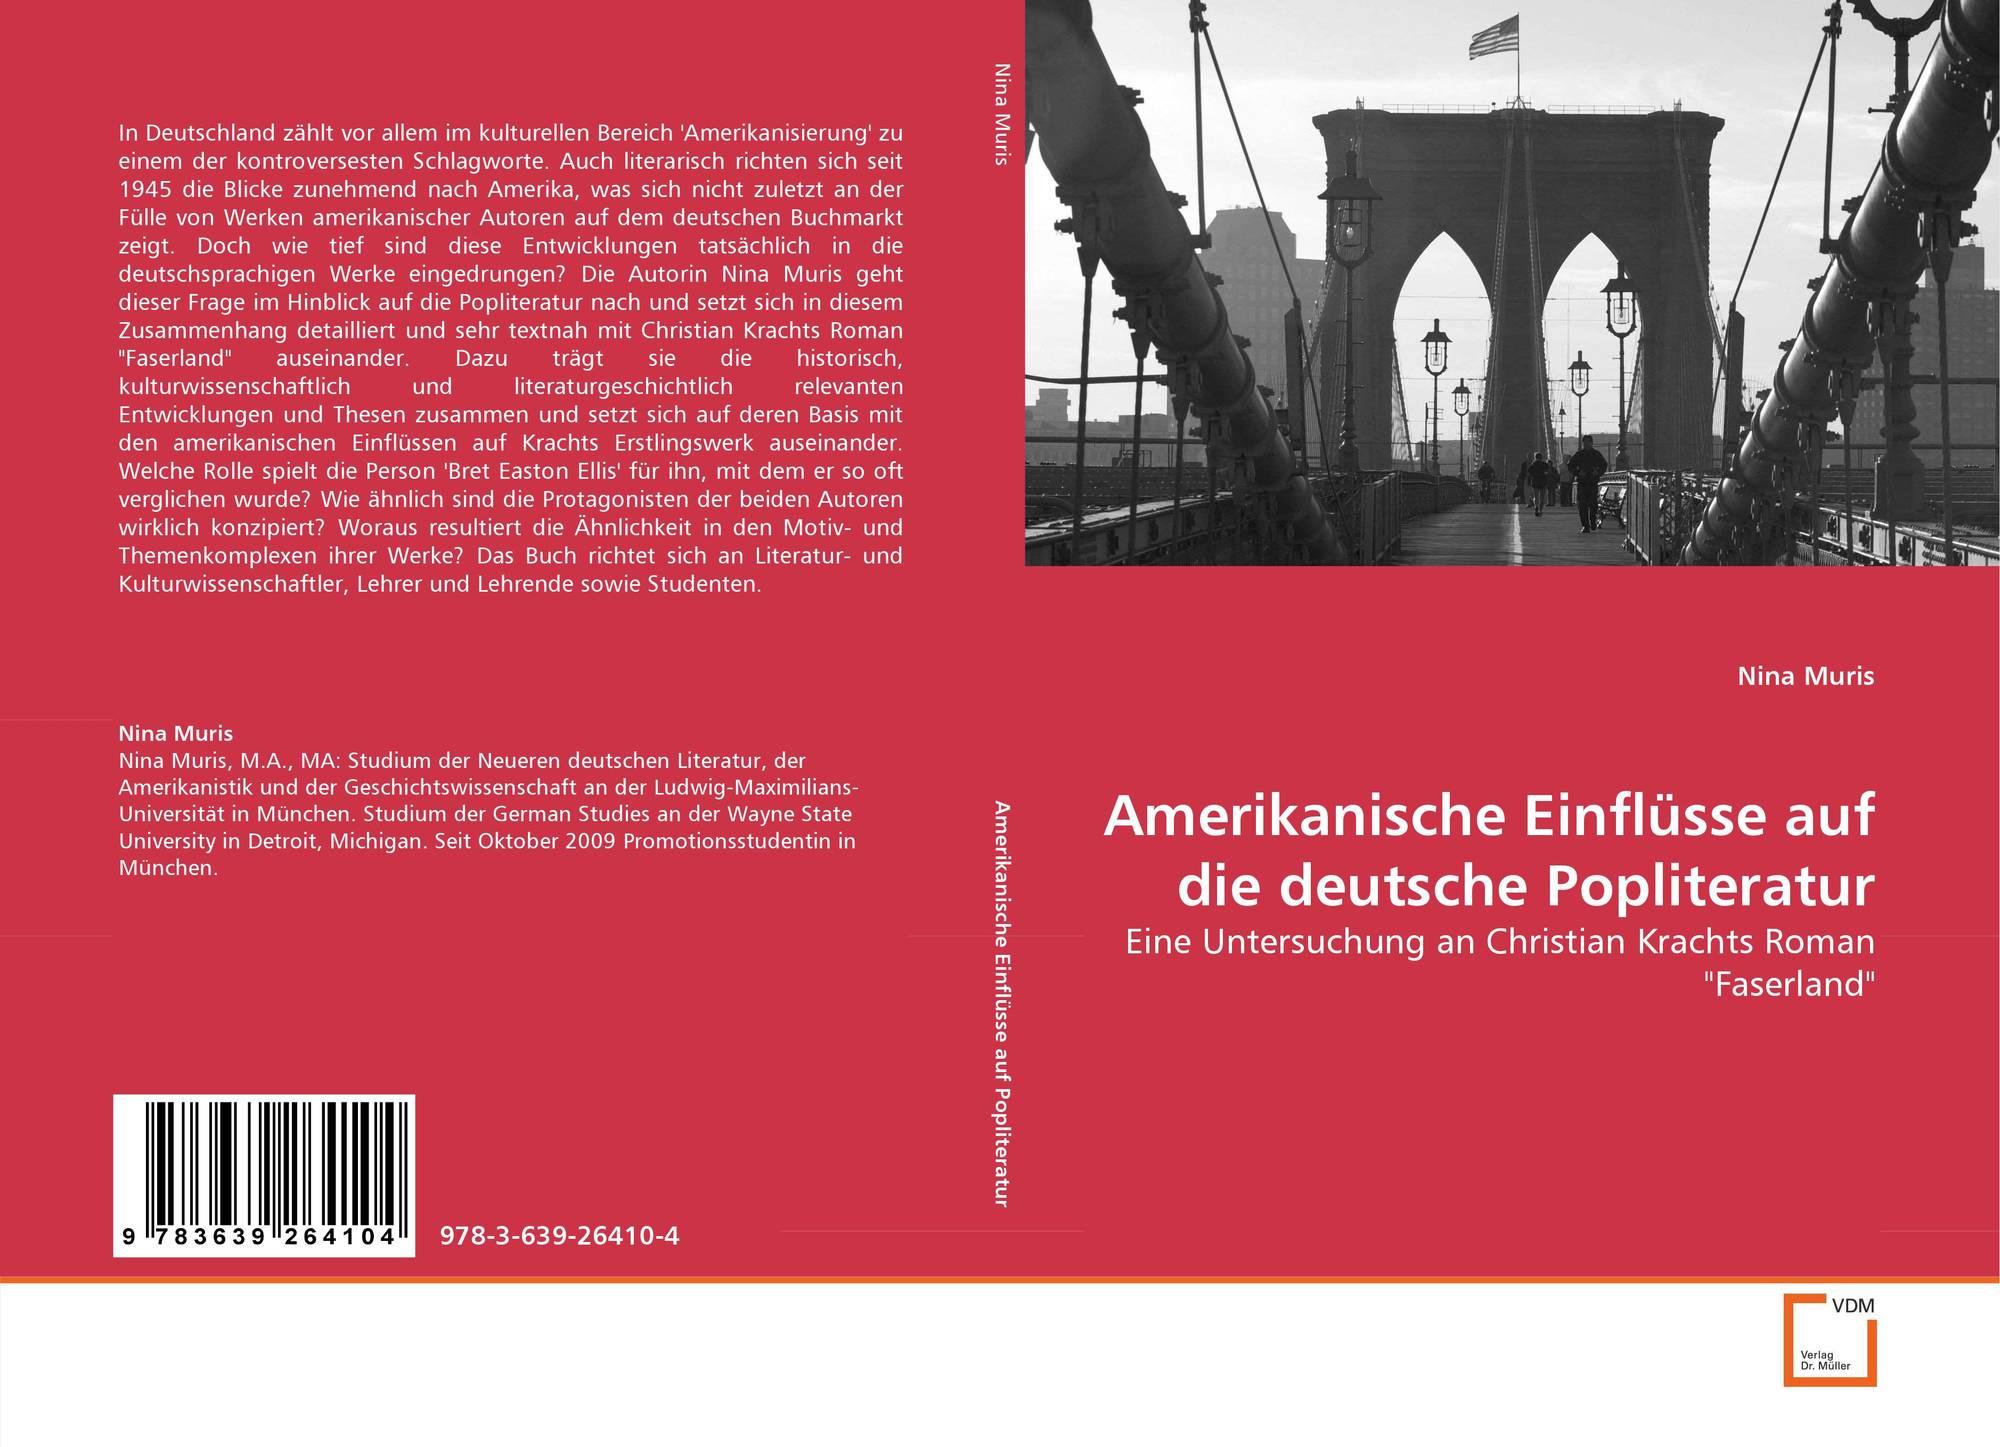 Christian kracht faserland pdf download